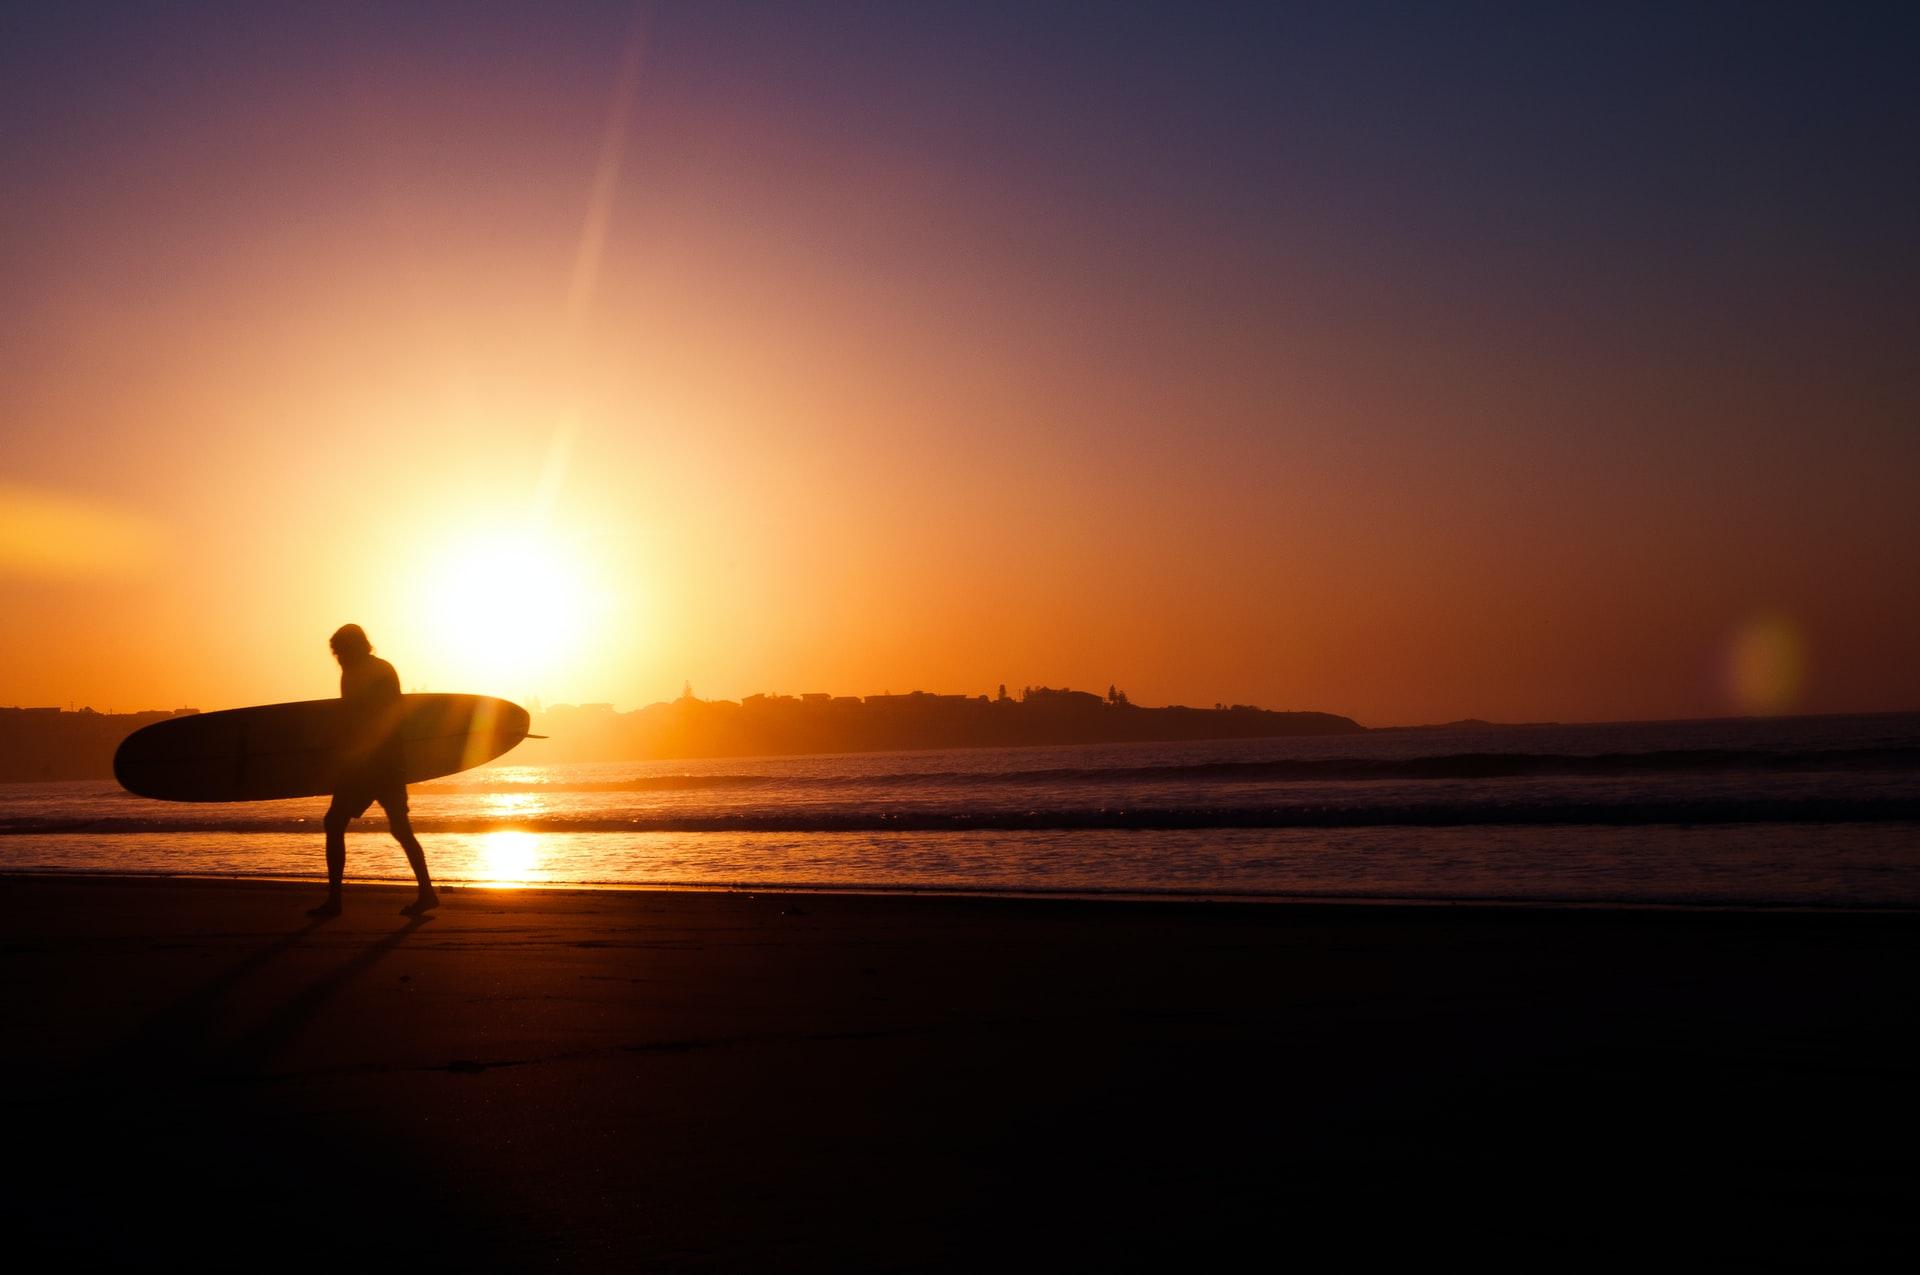 Sydney Surfer bei Sonnenuntergang